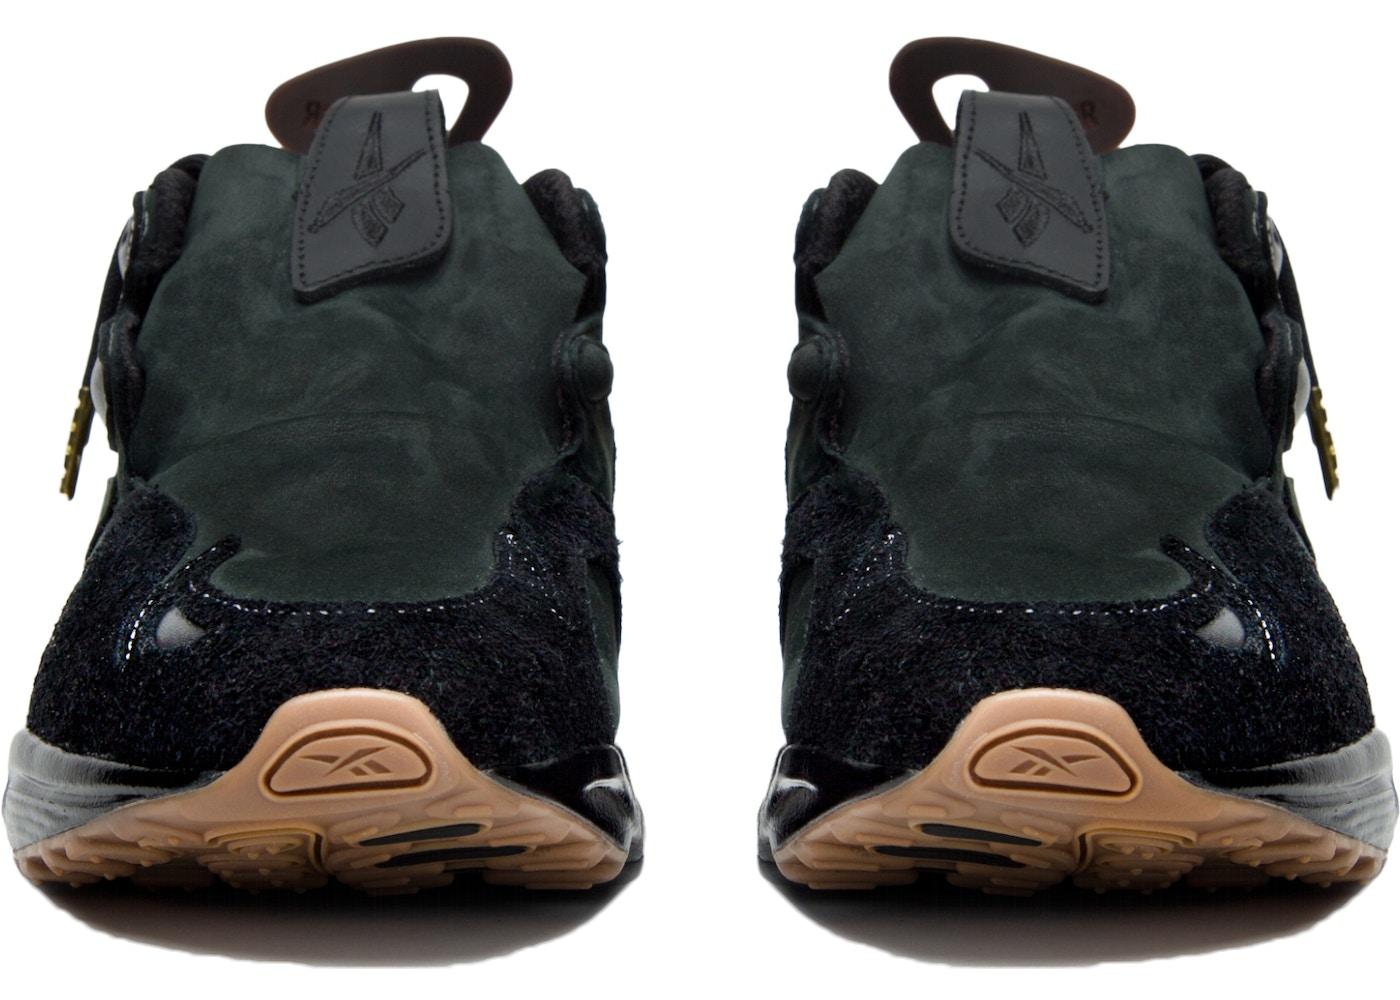 8e8a2c38a93c0 Reebok Size 13 Shoes - Release Date